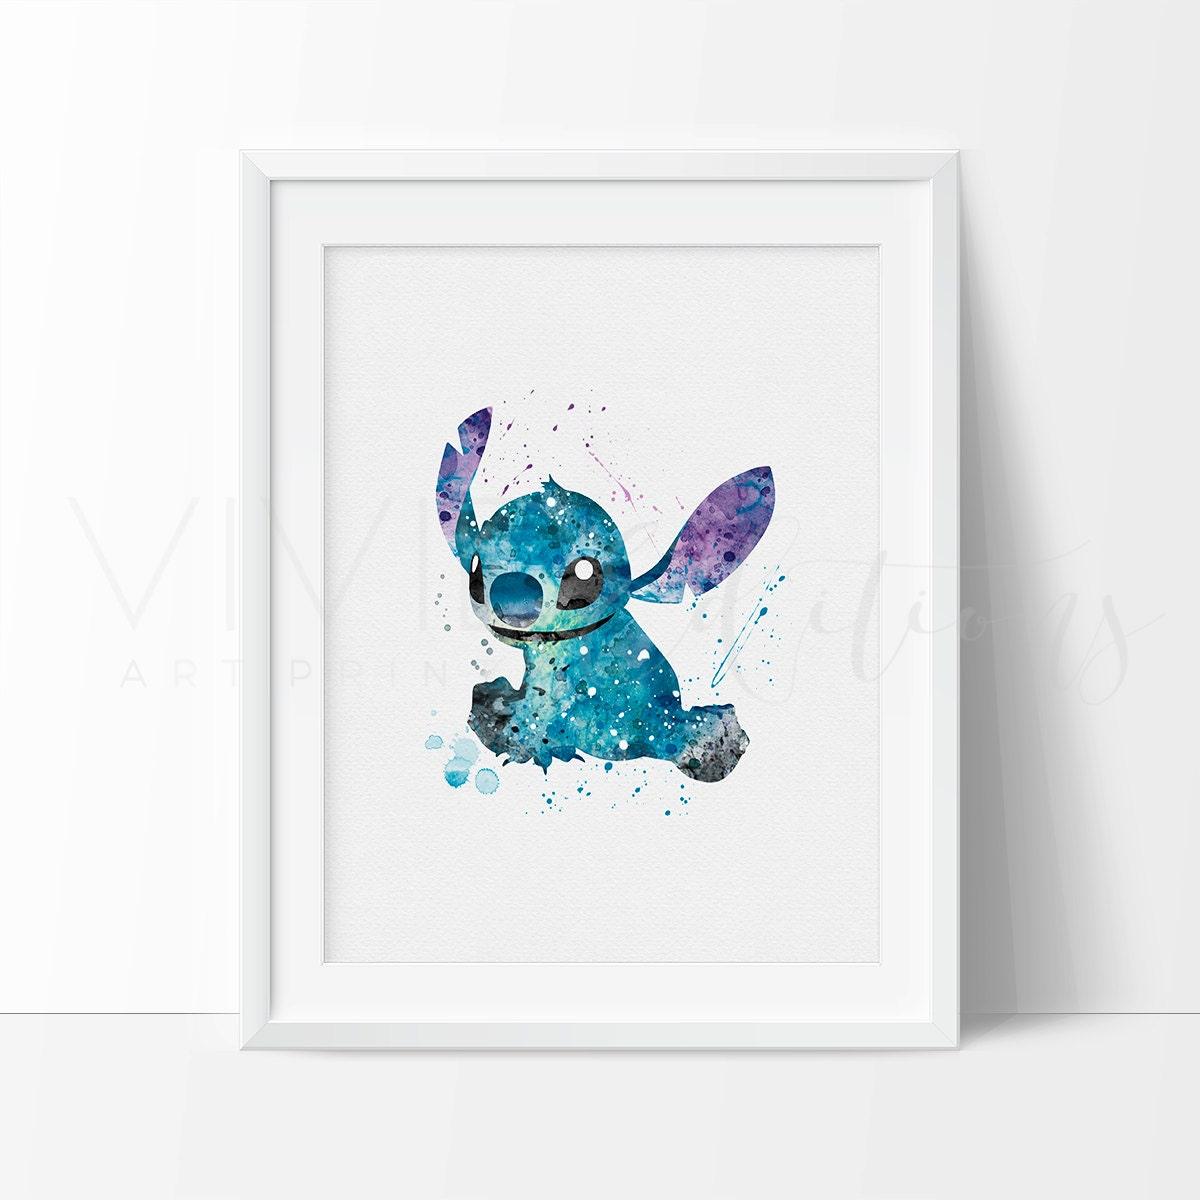 Stitch Print Lilo And Stitch Watercolor Art Nursery Kids